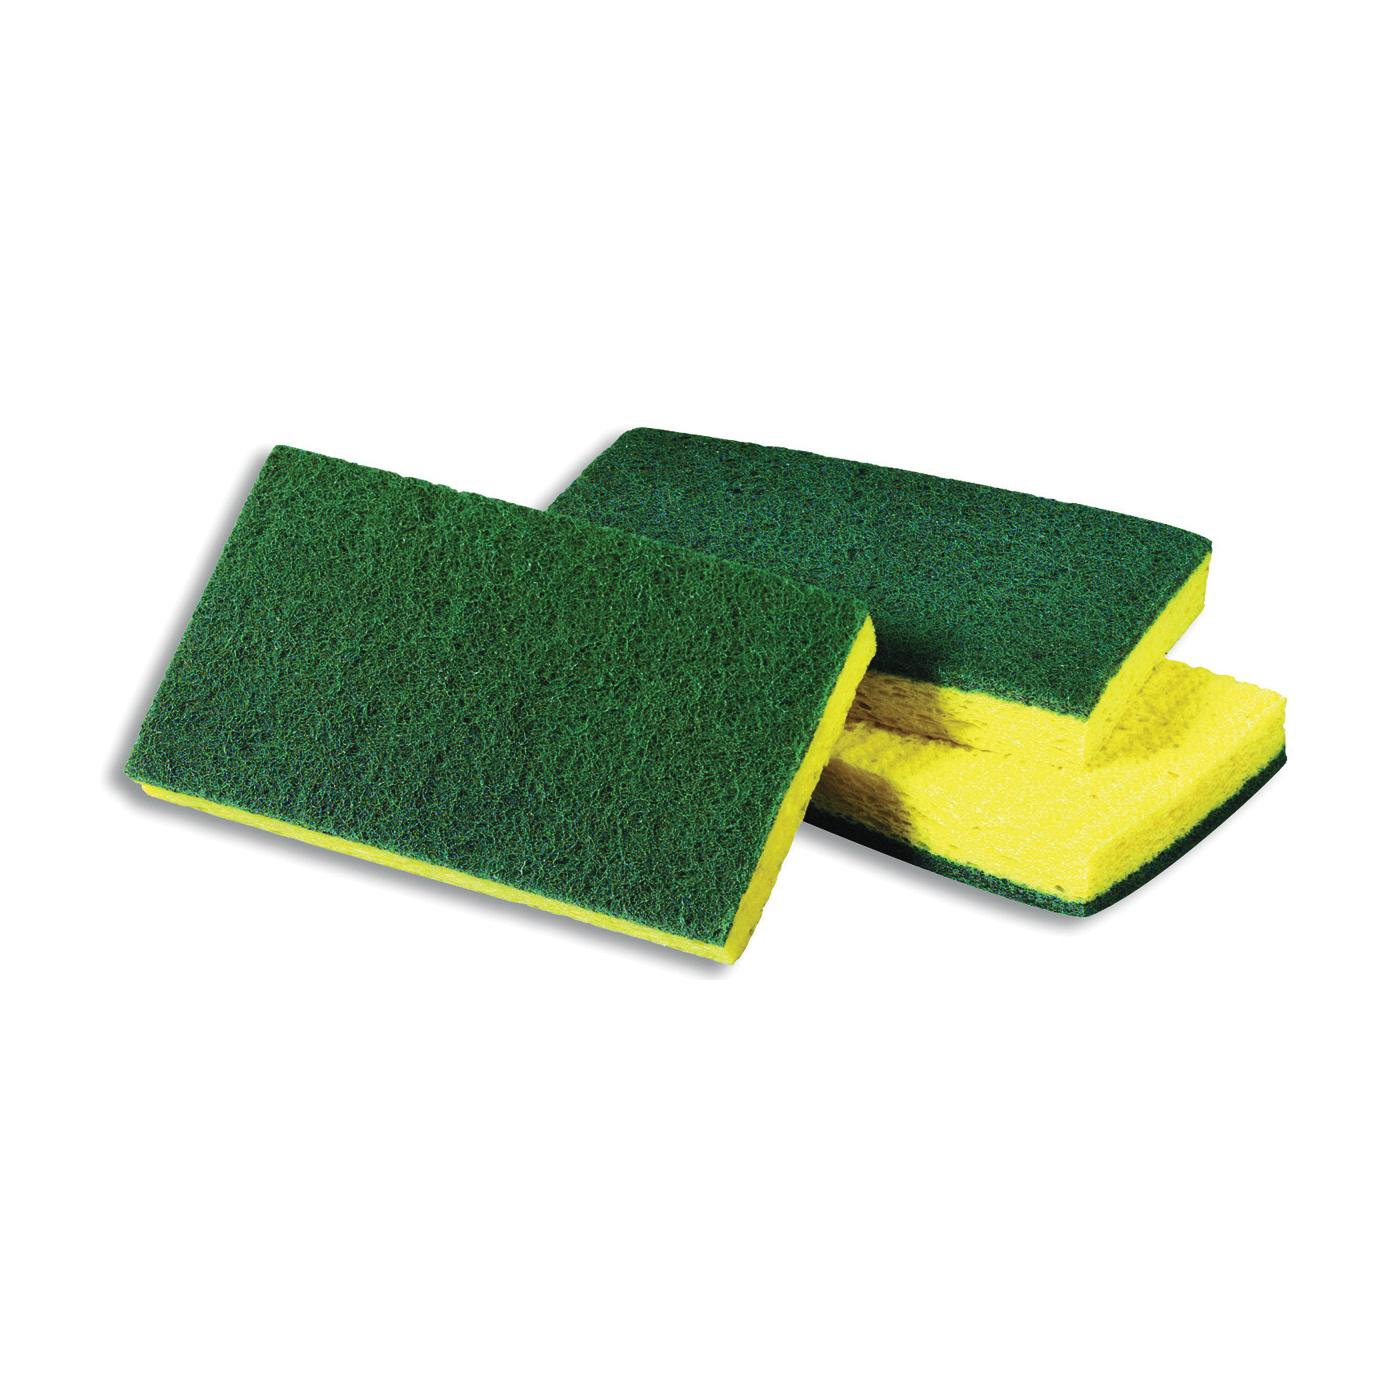 Picture of Scotch-Brite 74 Scrub Sponge, 6.1 in L, 3.6 in W, 0.7 in Thick, Cellulose/Fiber/Mineral/Resin, Green/Yellow